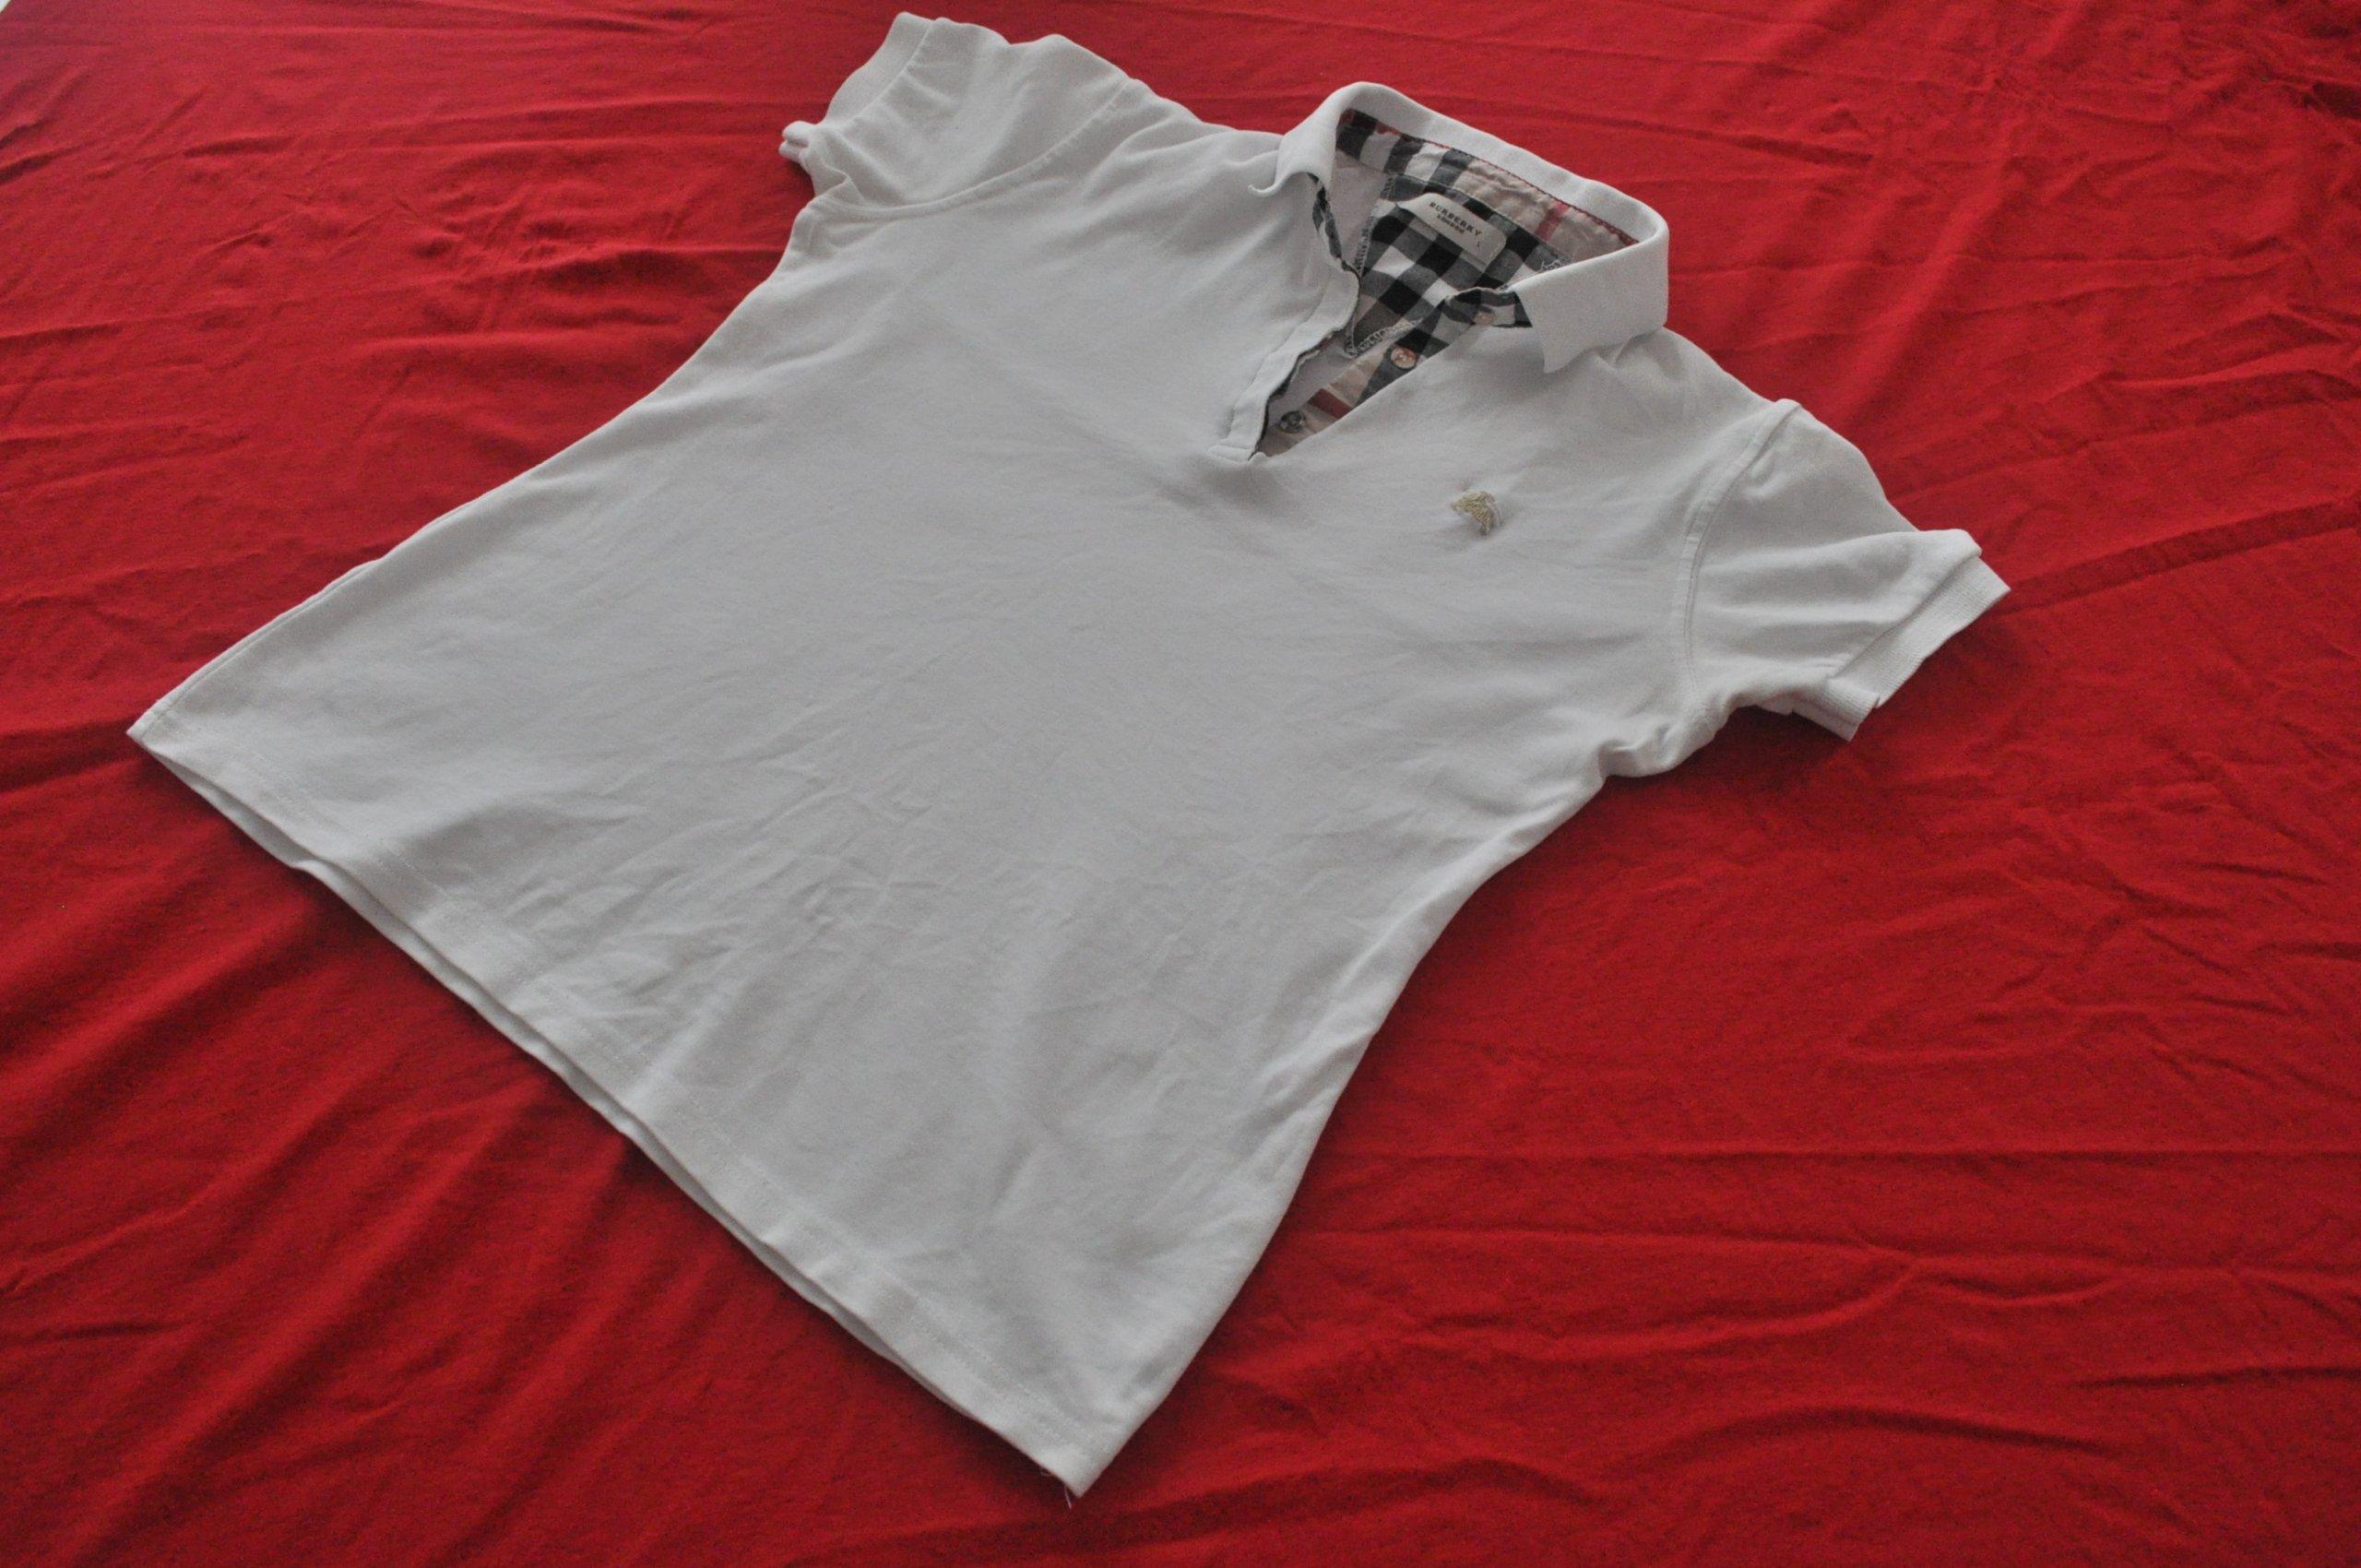 a5abfaa37 BURBERRY biała koszulka polo bluzka M L 38 40 - 7330899725 ...